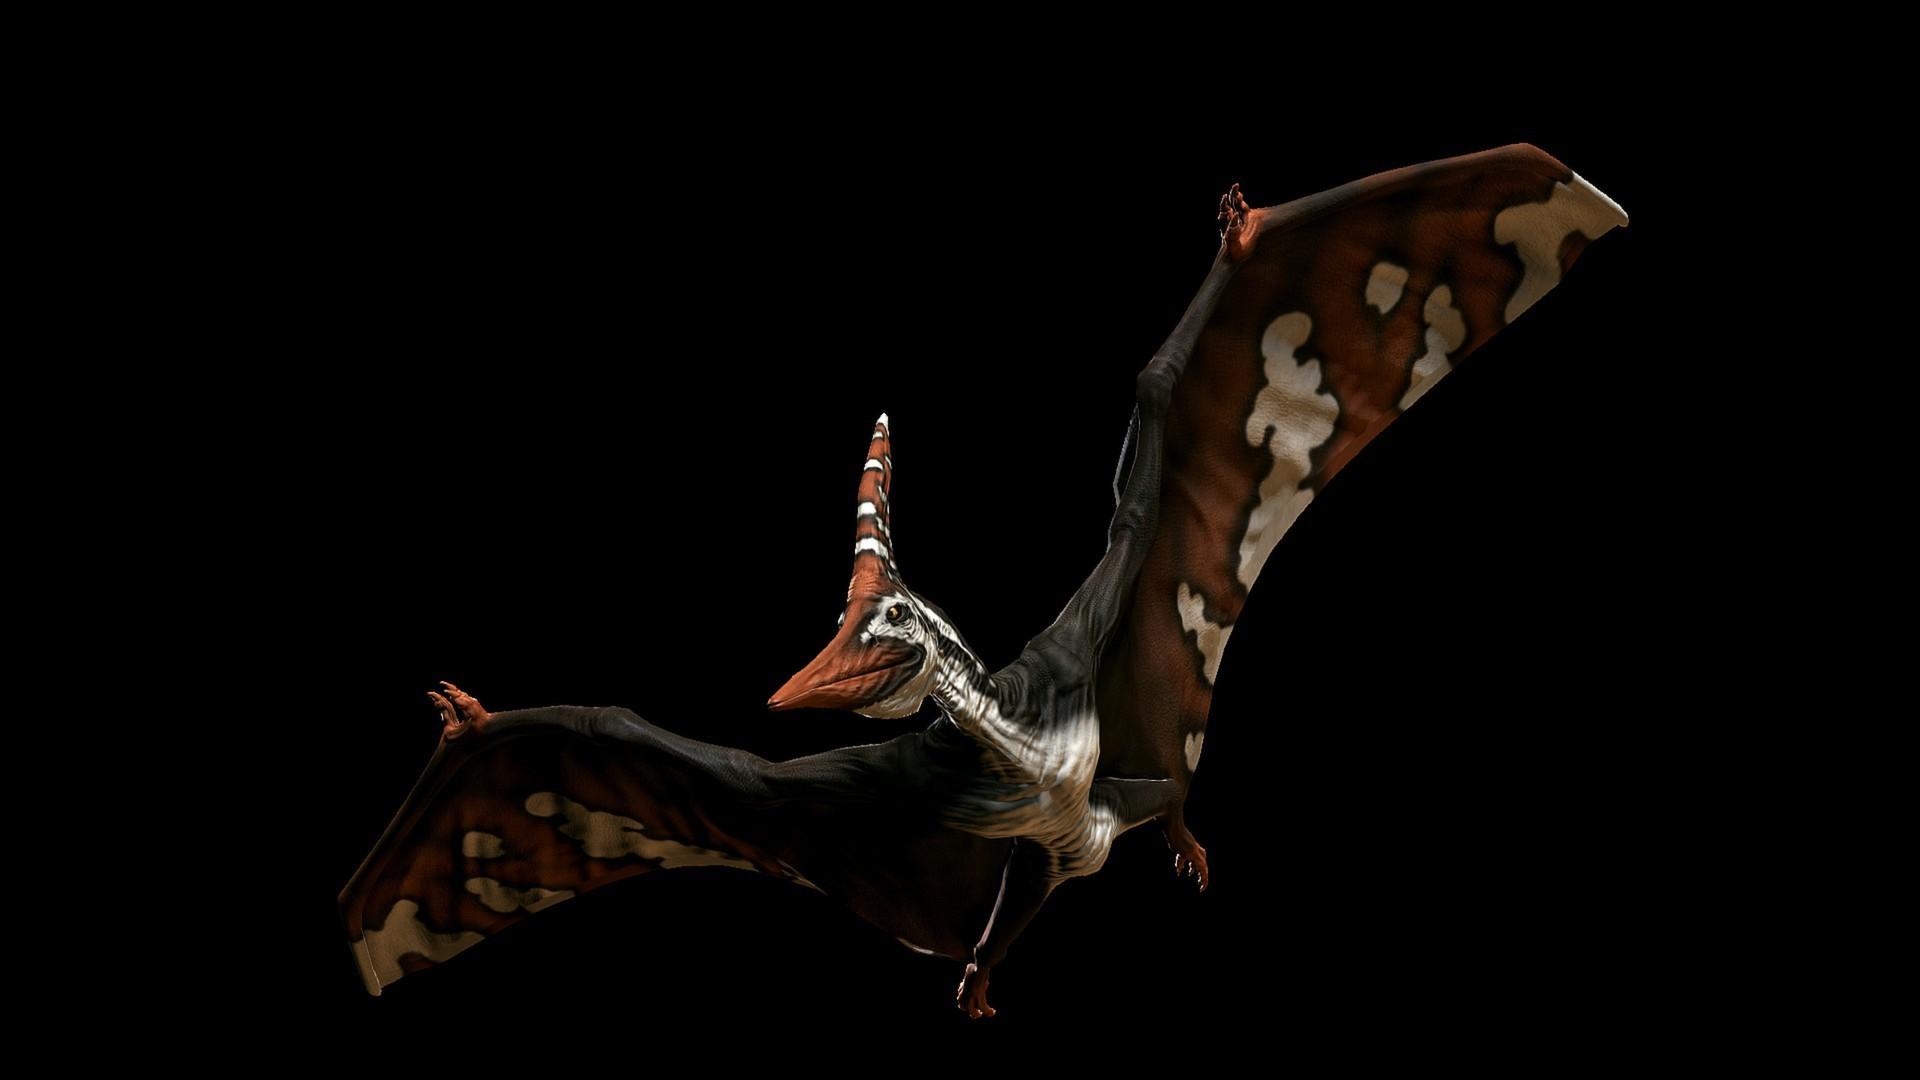 PRIMAL CARNAGE fantasy dinosaur u wallpaper 1920x1080 169035 1920x1080